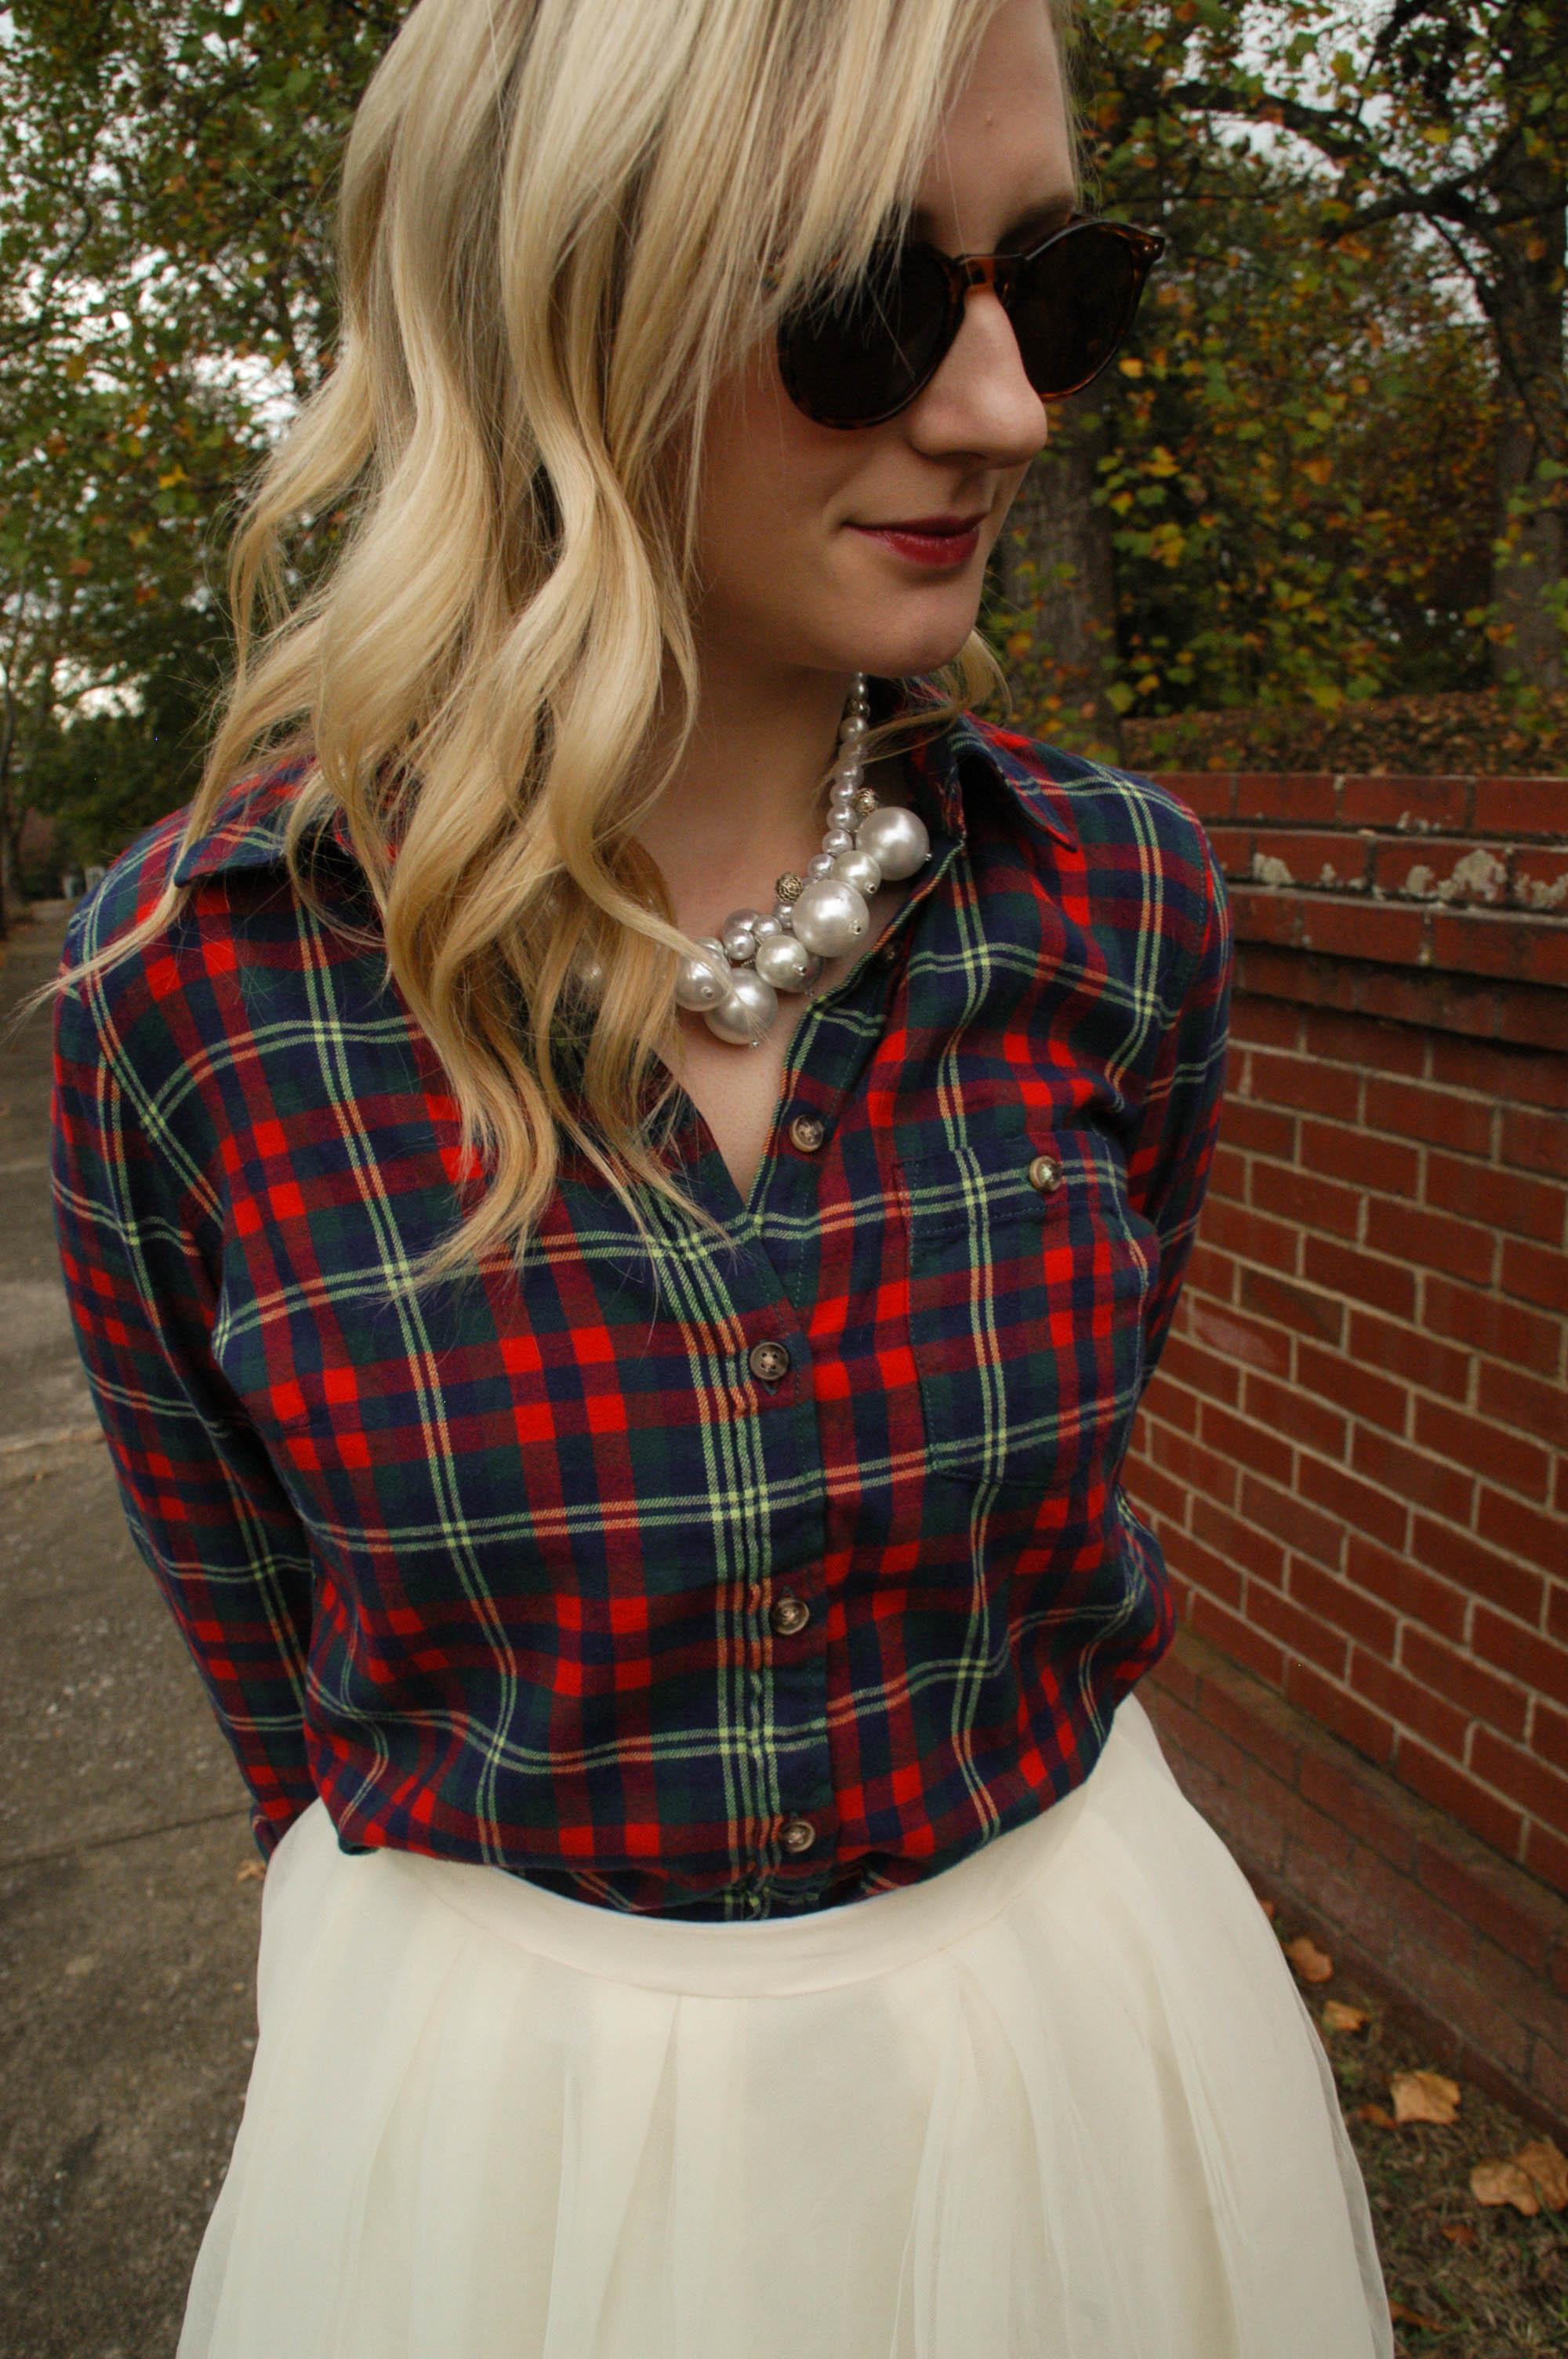 Flannel:  H&M  (L.O.G.G. brand) | Skirt: Handmade (also seen  here ) | Shoes: JCPenney (Cosmopolitan) | Bag: Coach | Necklace: Handmade | Glasses: Forever 21 (similar  here )